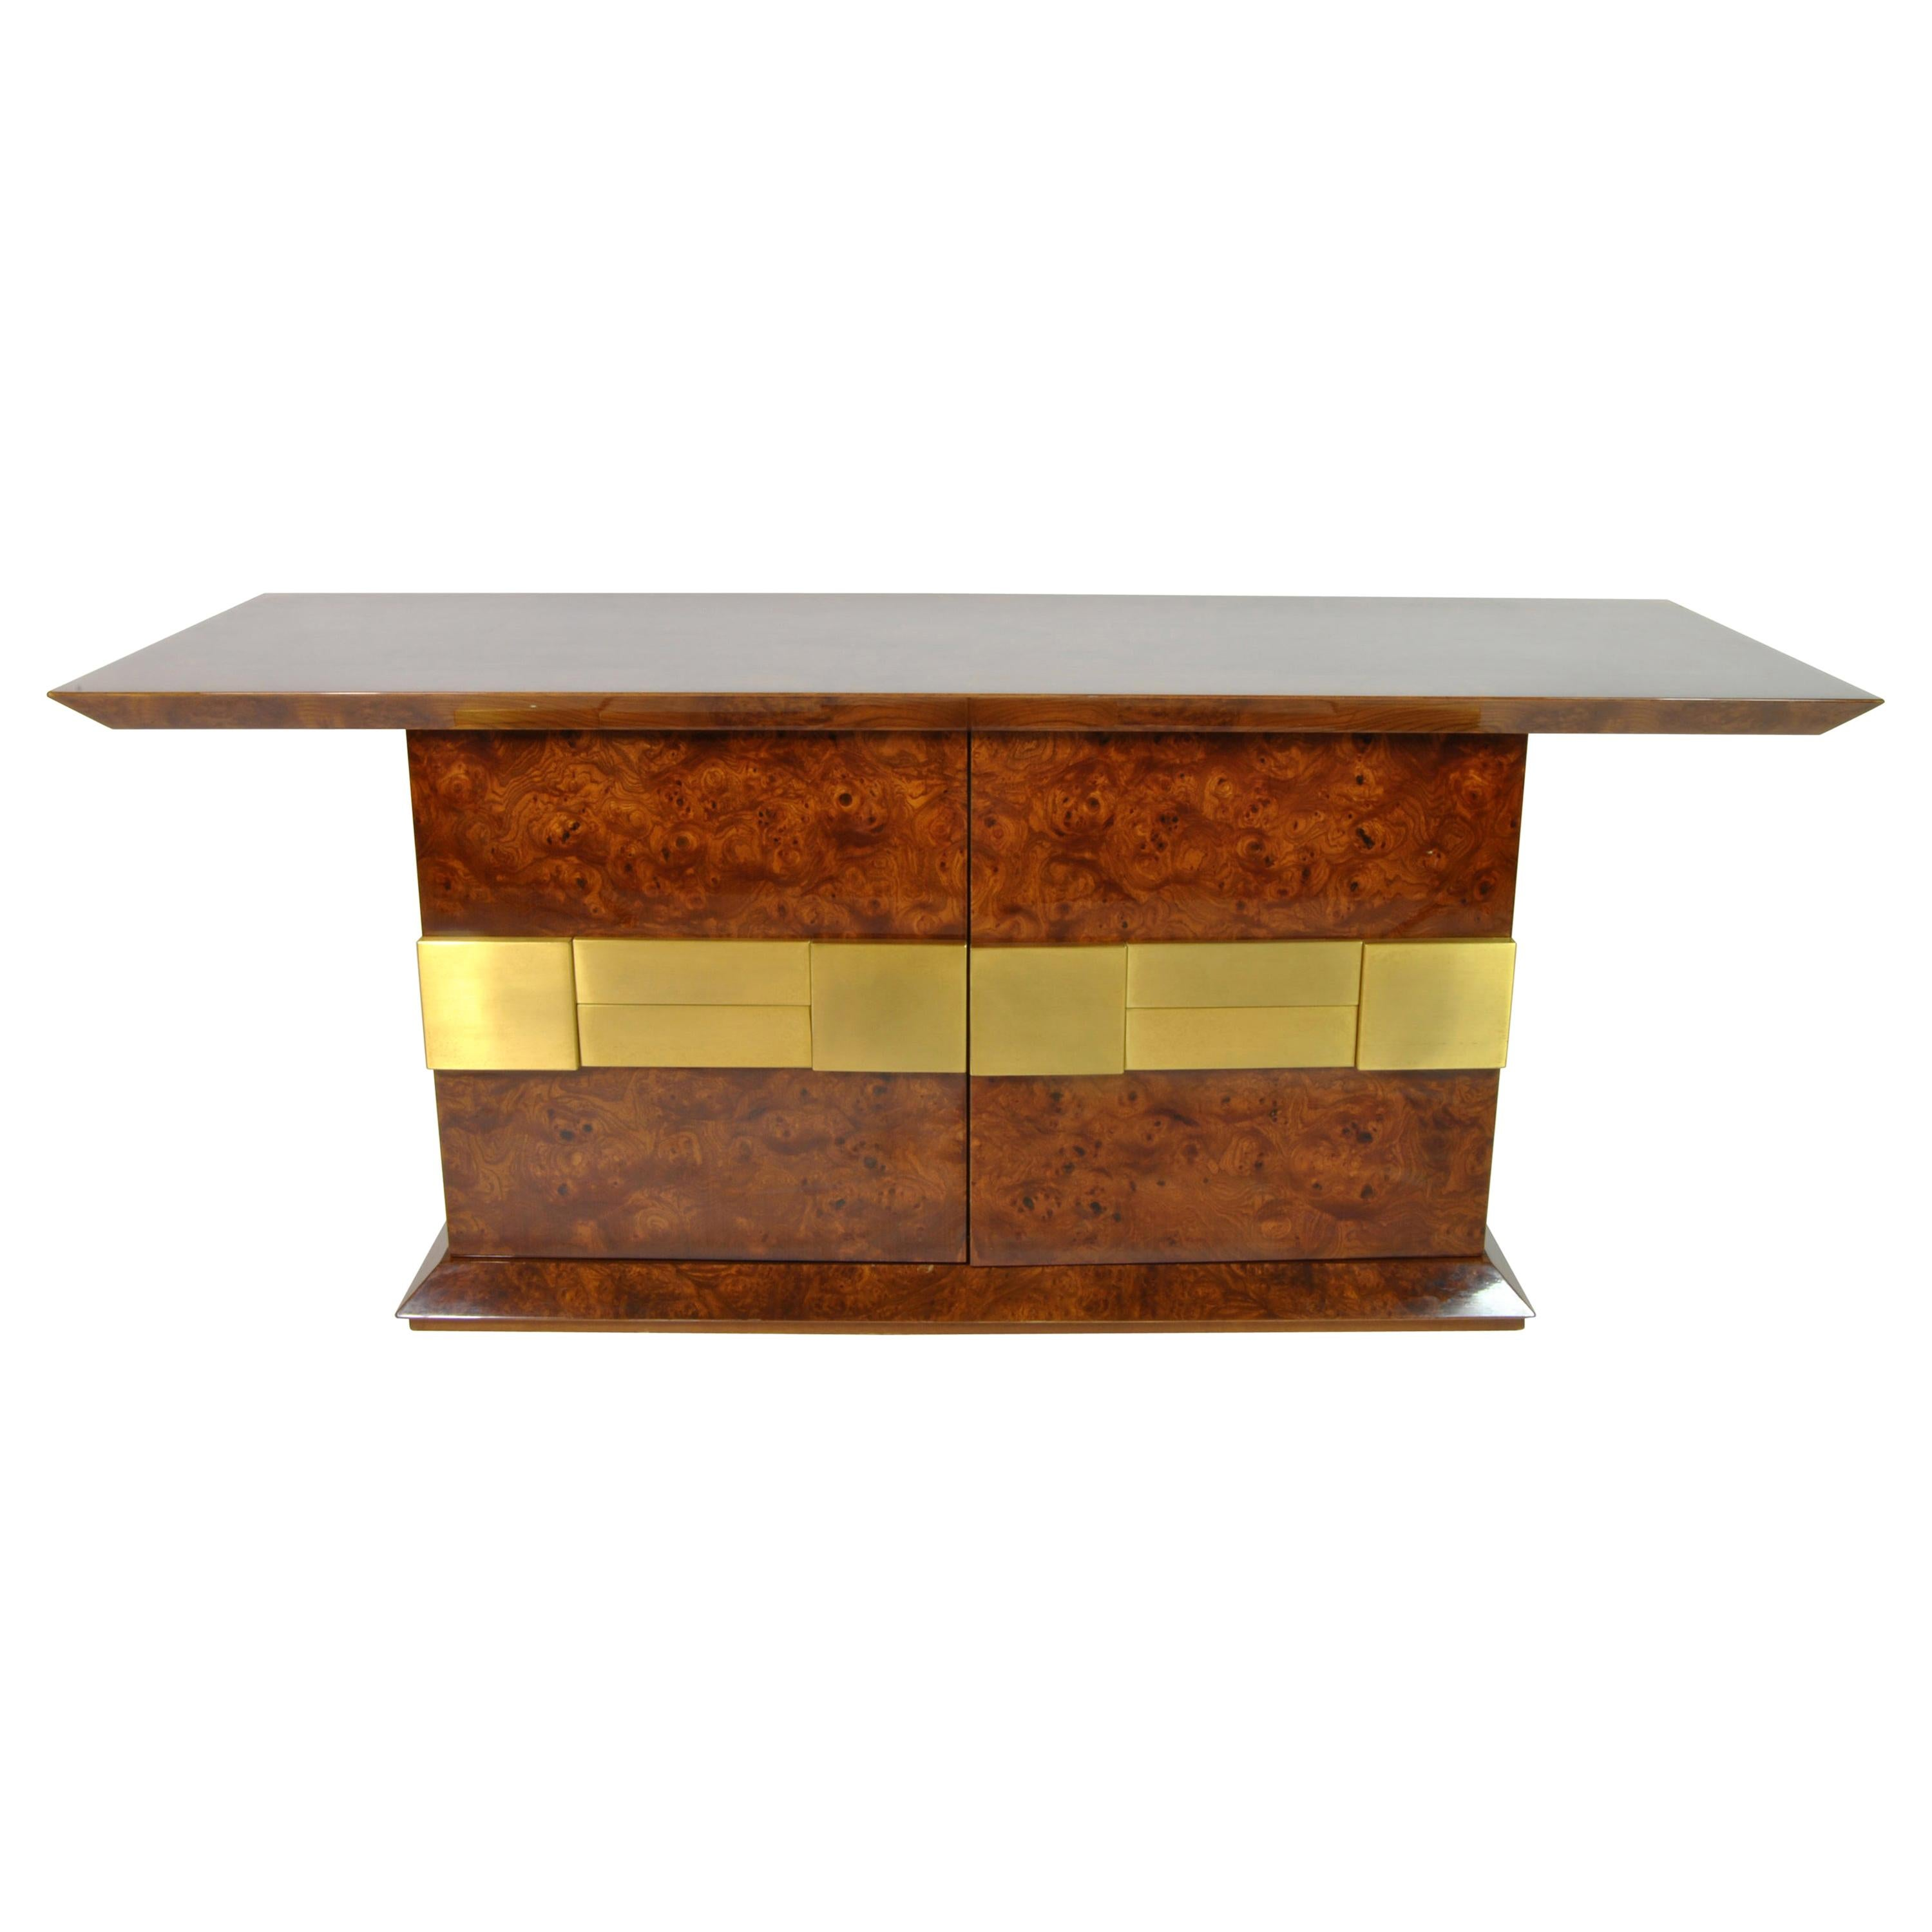 Buffet, Design Luciano Frigerio, Italy, 1970